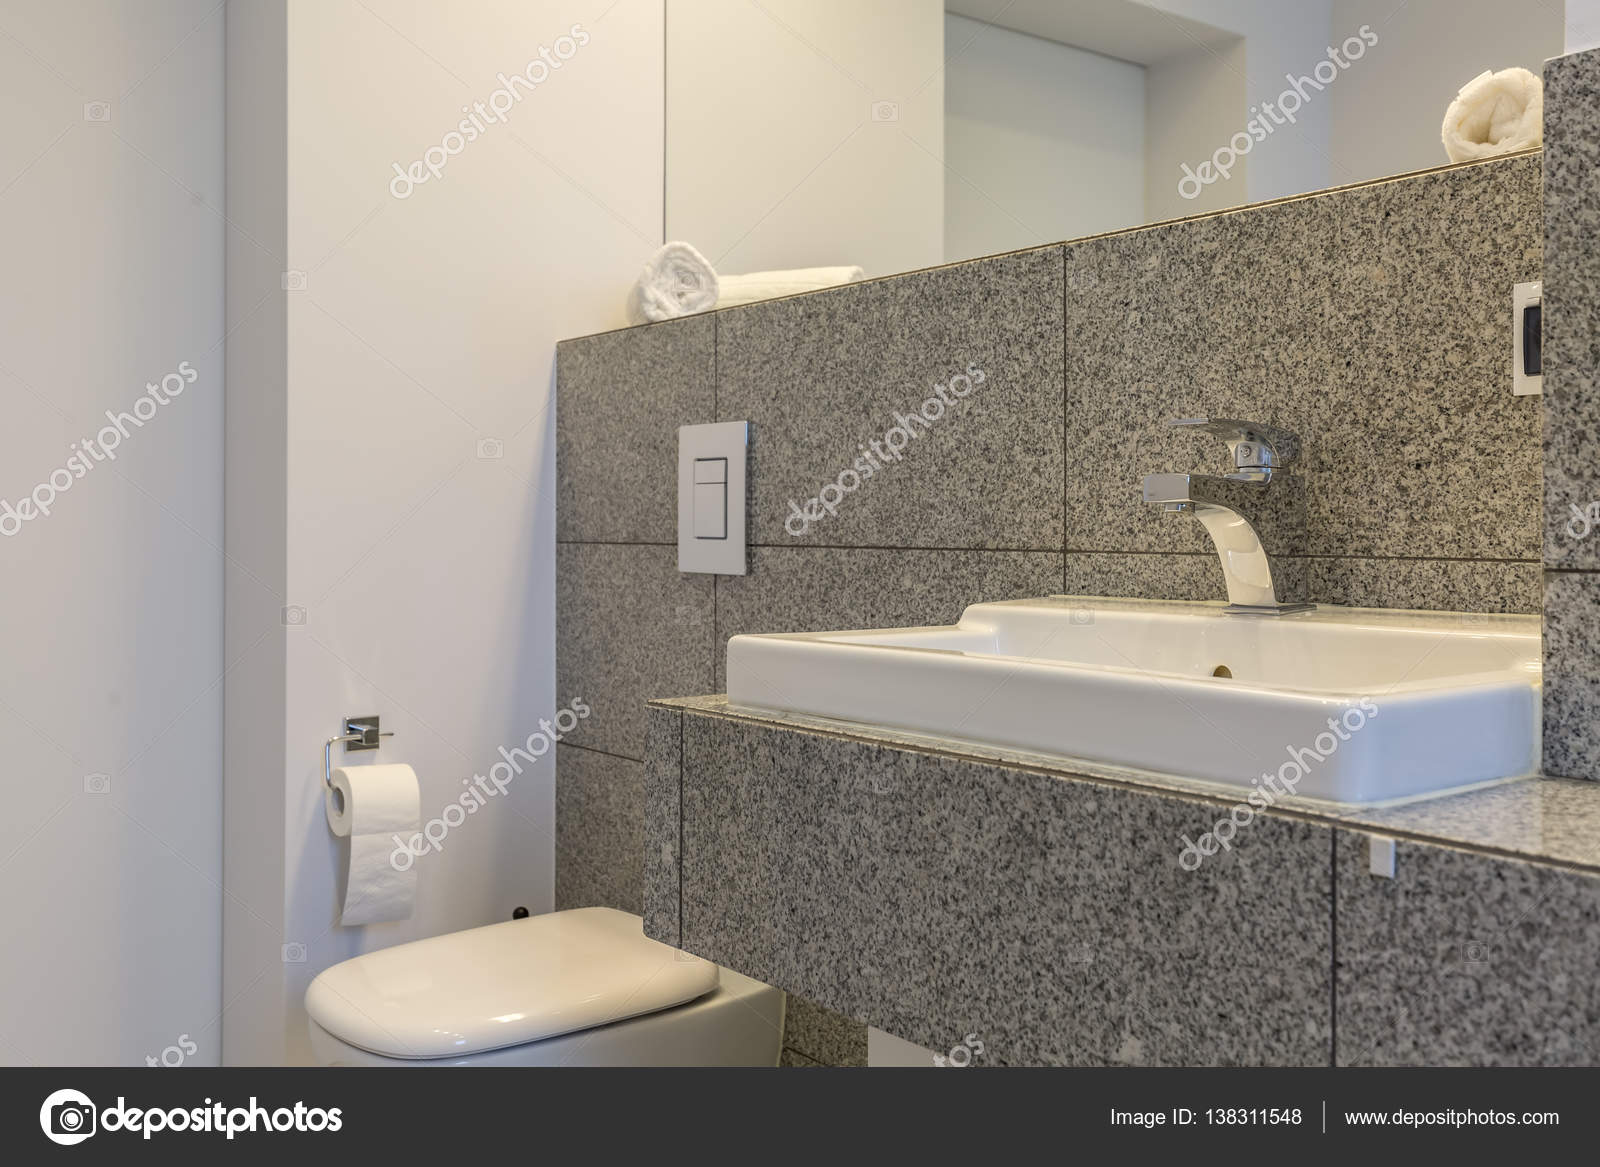 Granite tiles in minimalist bathroom stock photo for Arredo minimal home